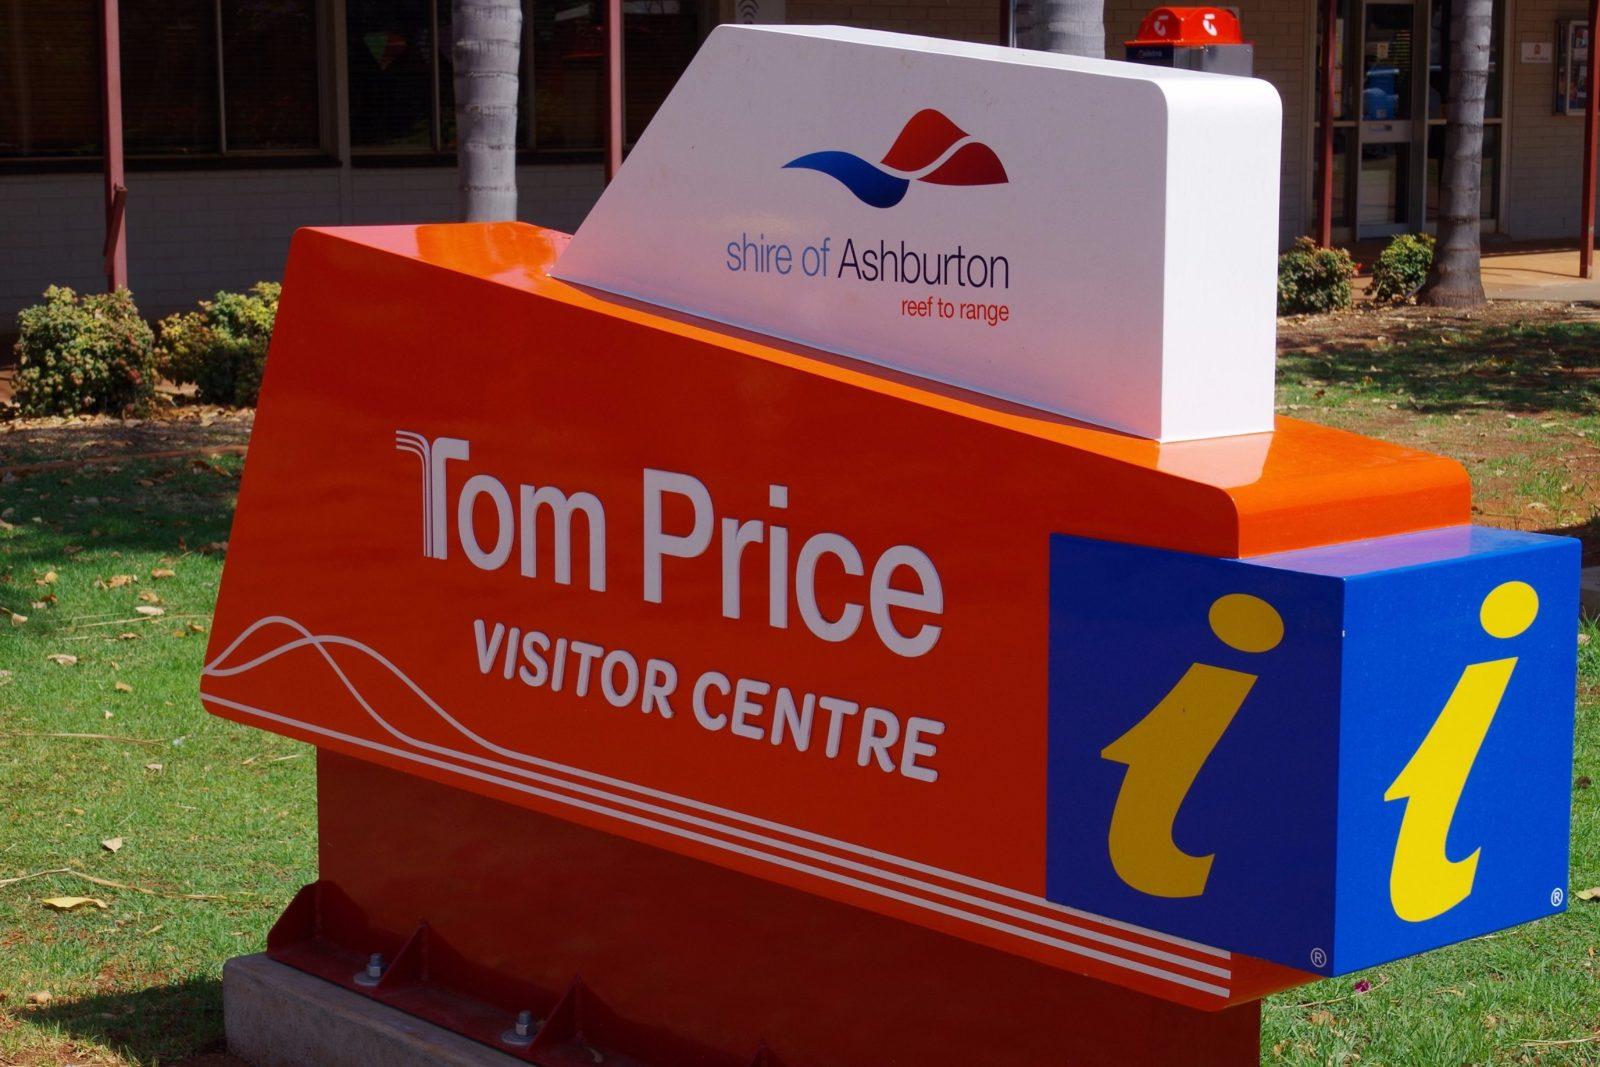 Tom Price Visitor Centre, Western Australia